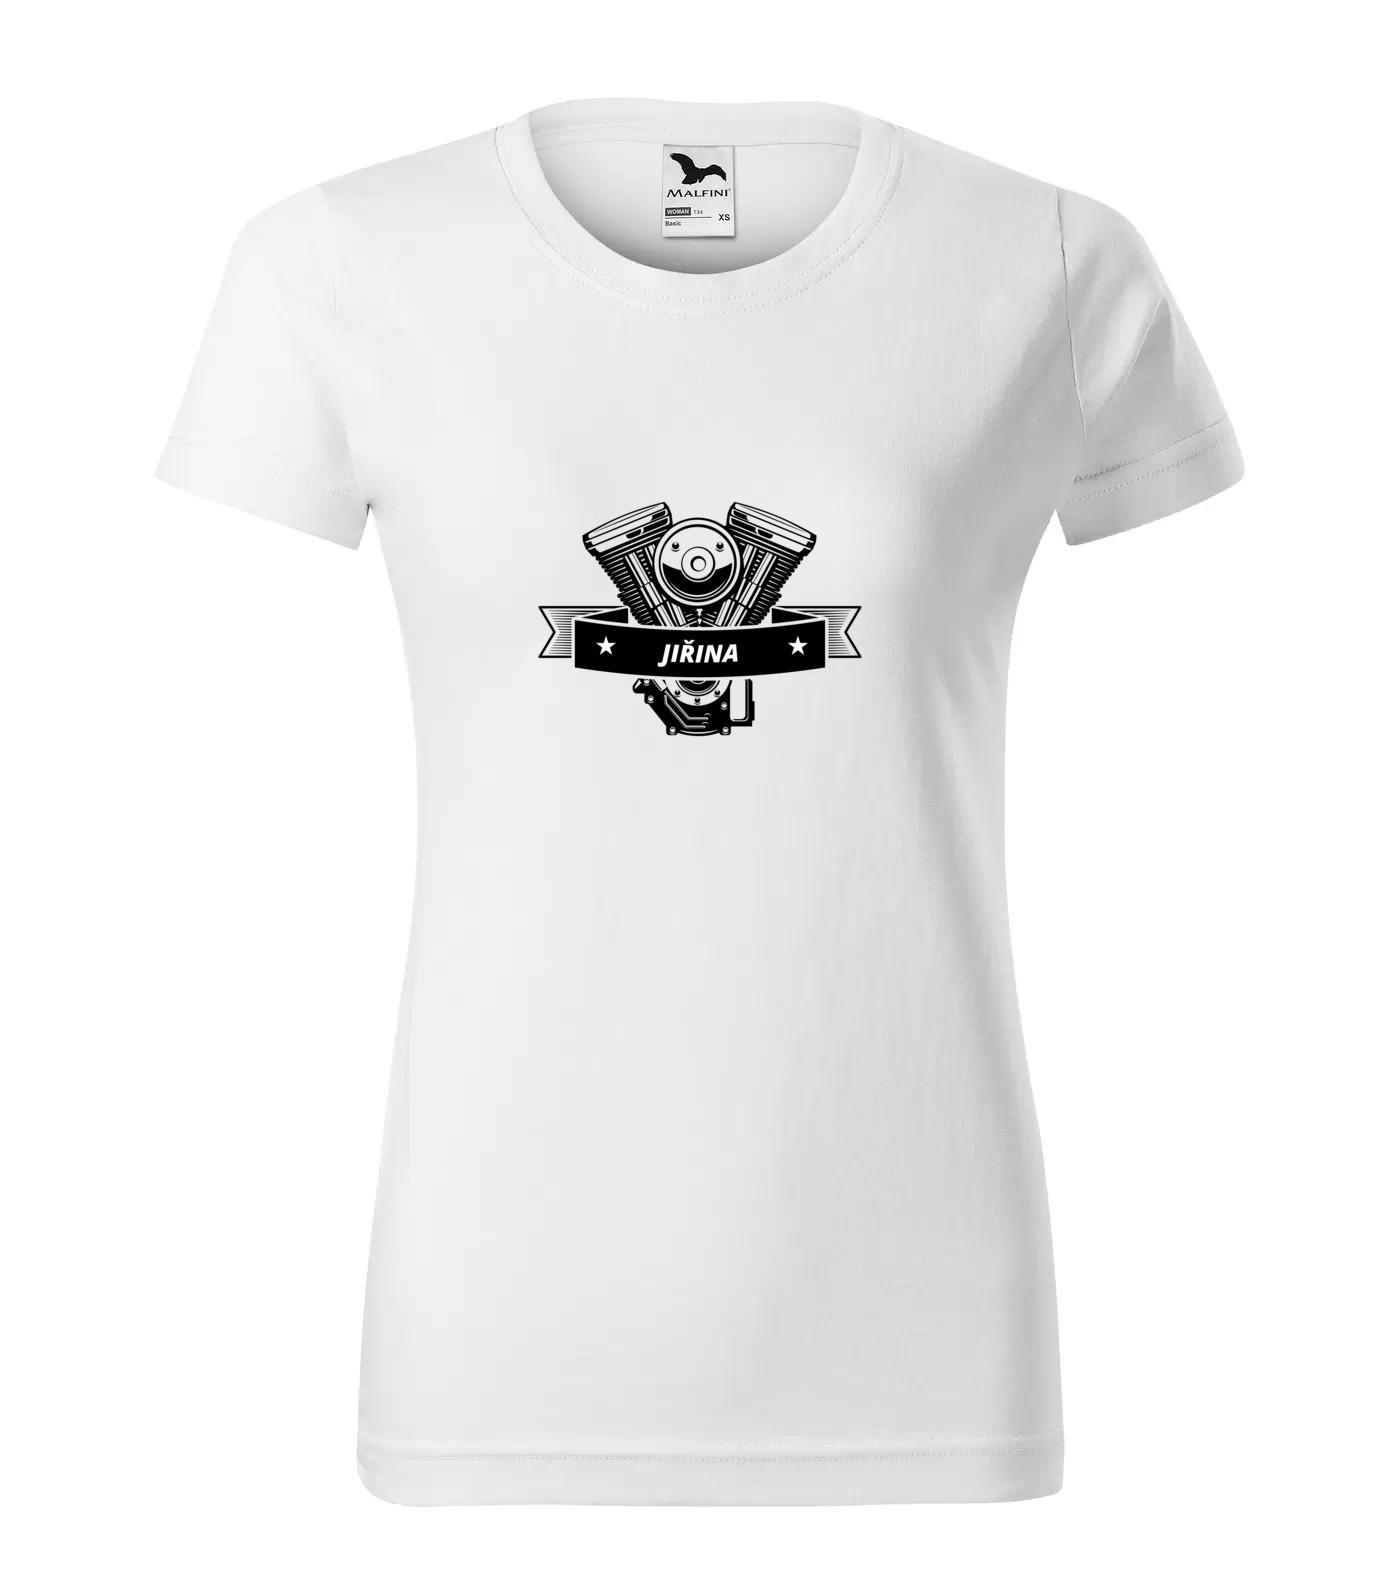 Tričko Motorkářka Jiřina